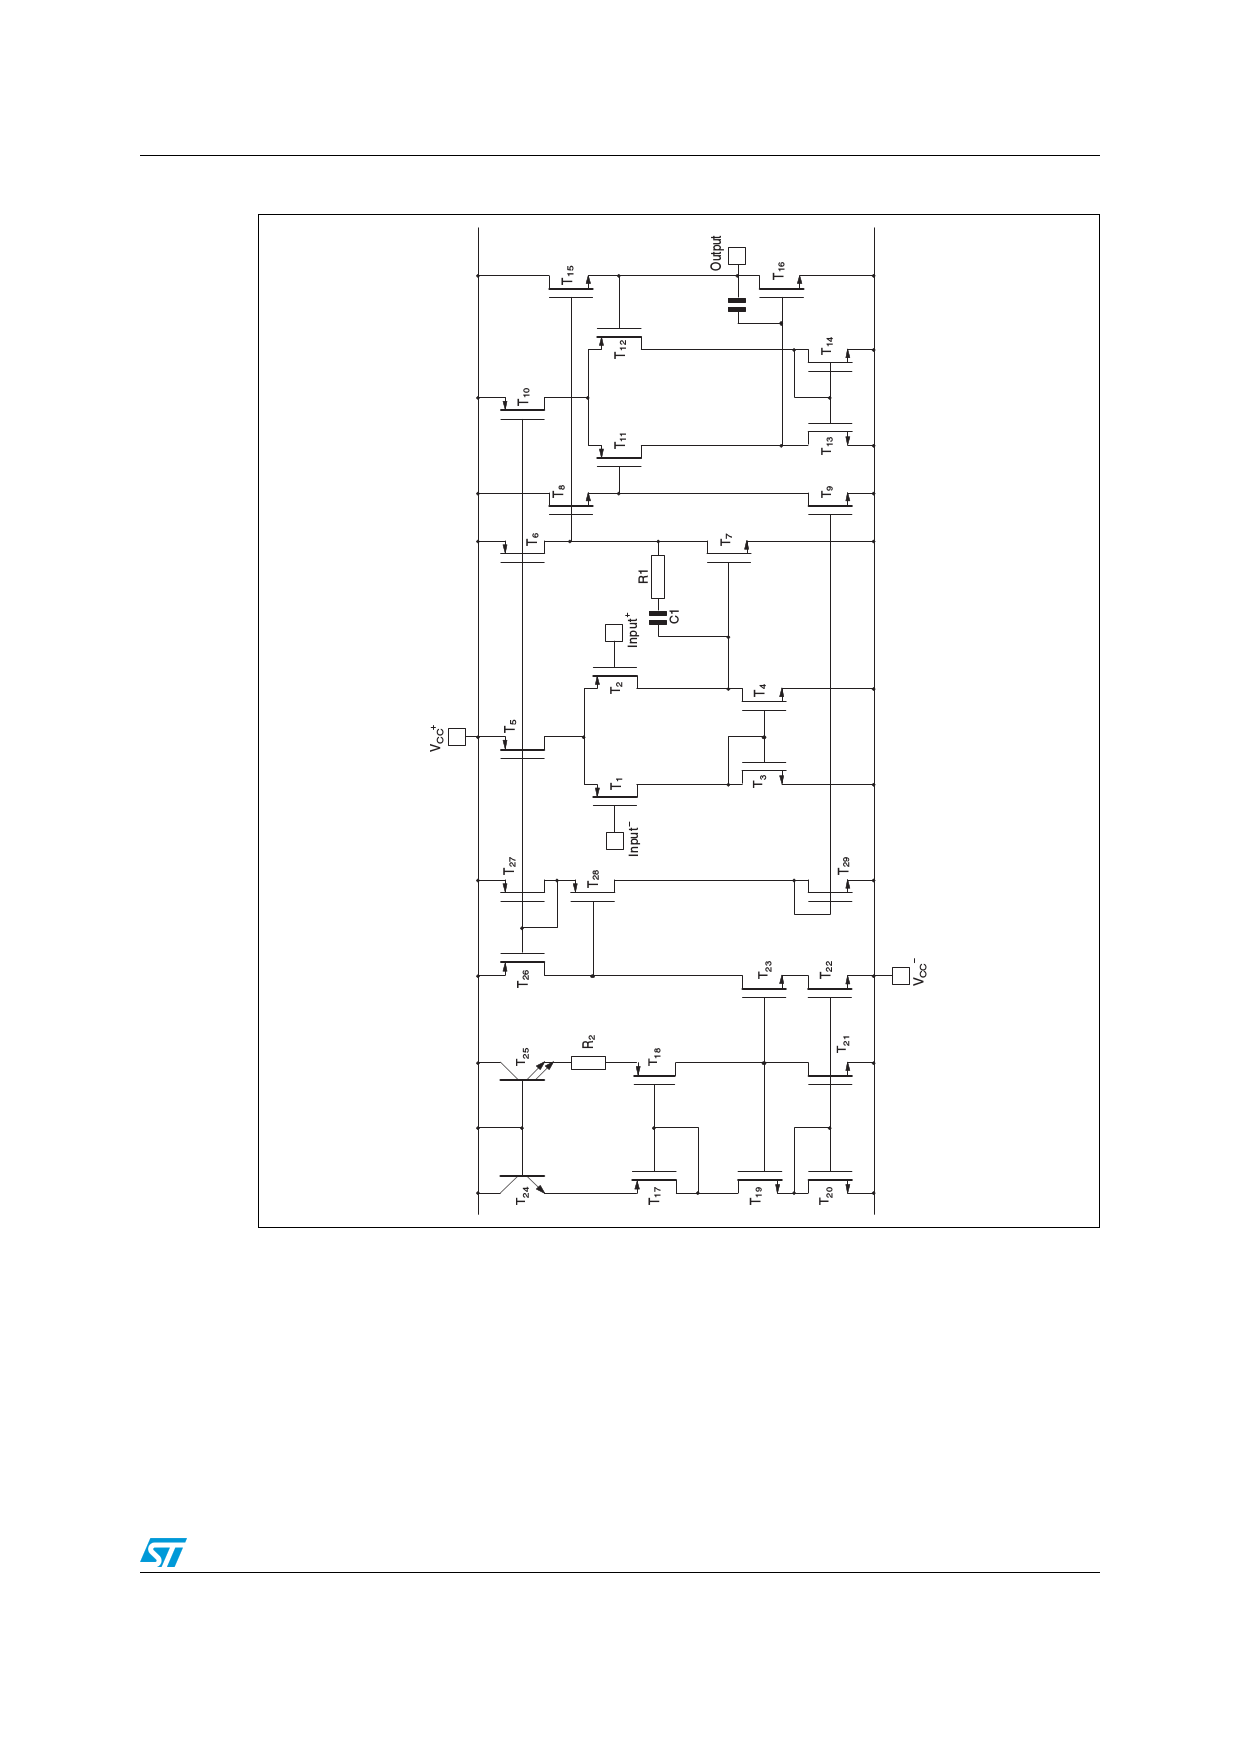 TS27M2 pdf, ピン配列